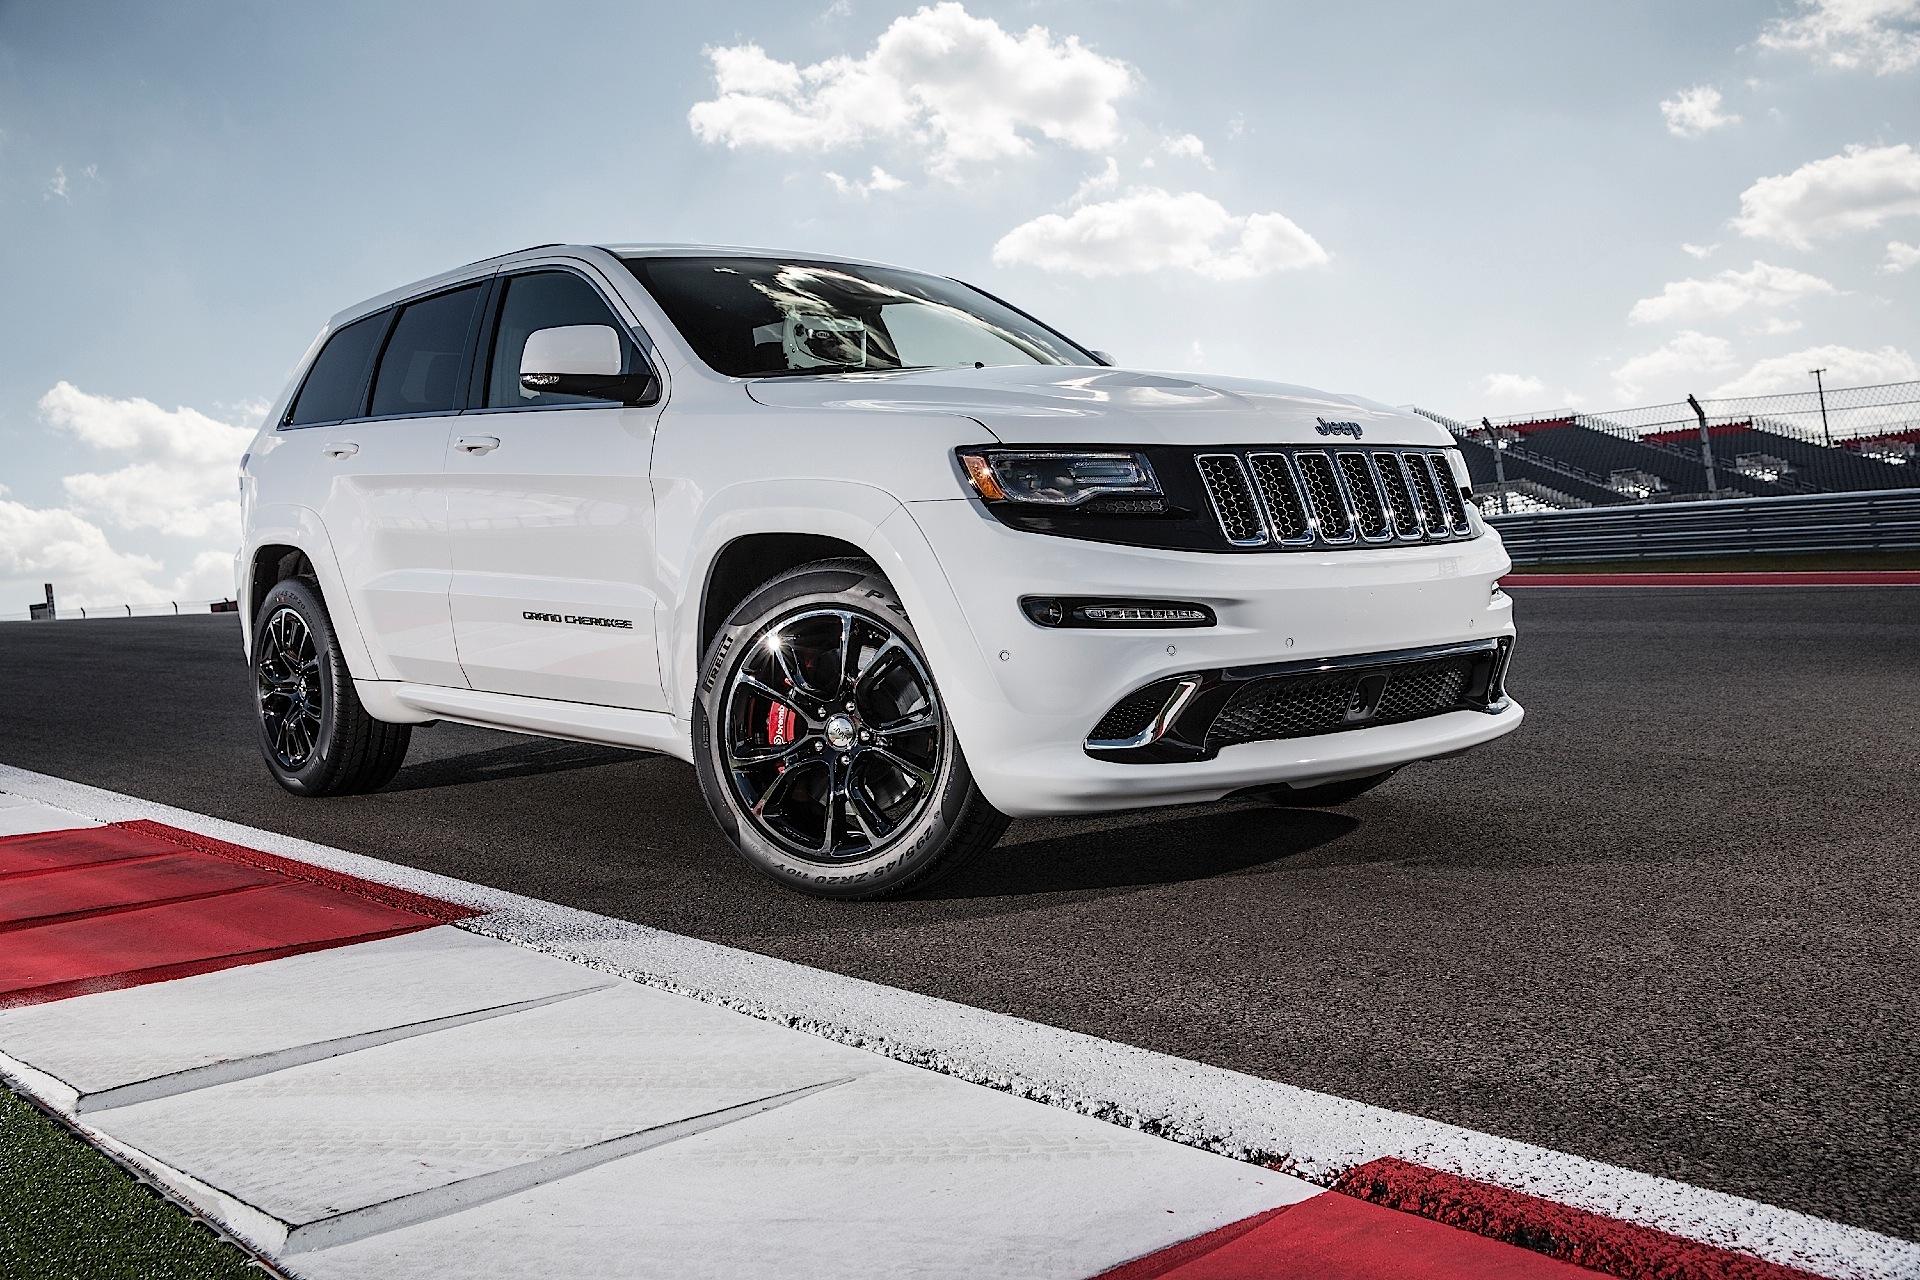 Jeep Grand Cherokee Srt Specs Photos 2013 2014 2015 2016 2017 2018 2019 2020 Autoevolution